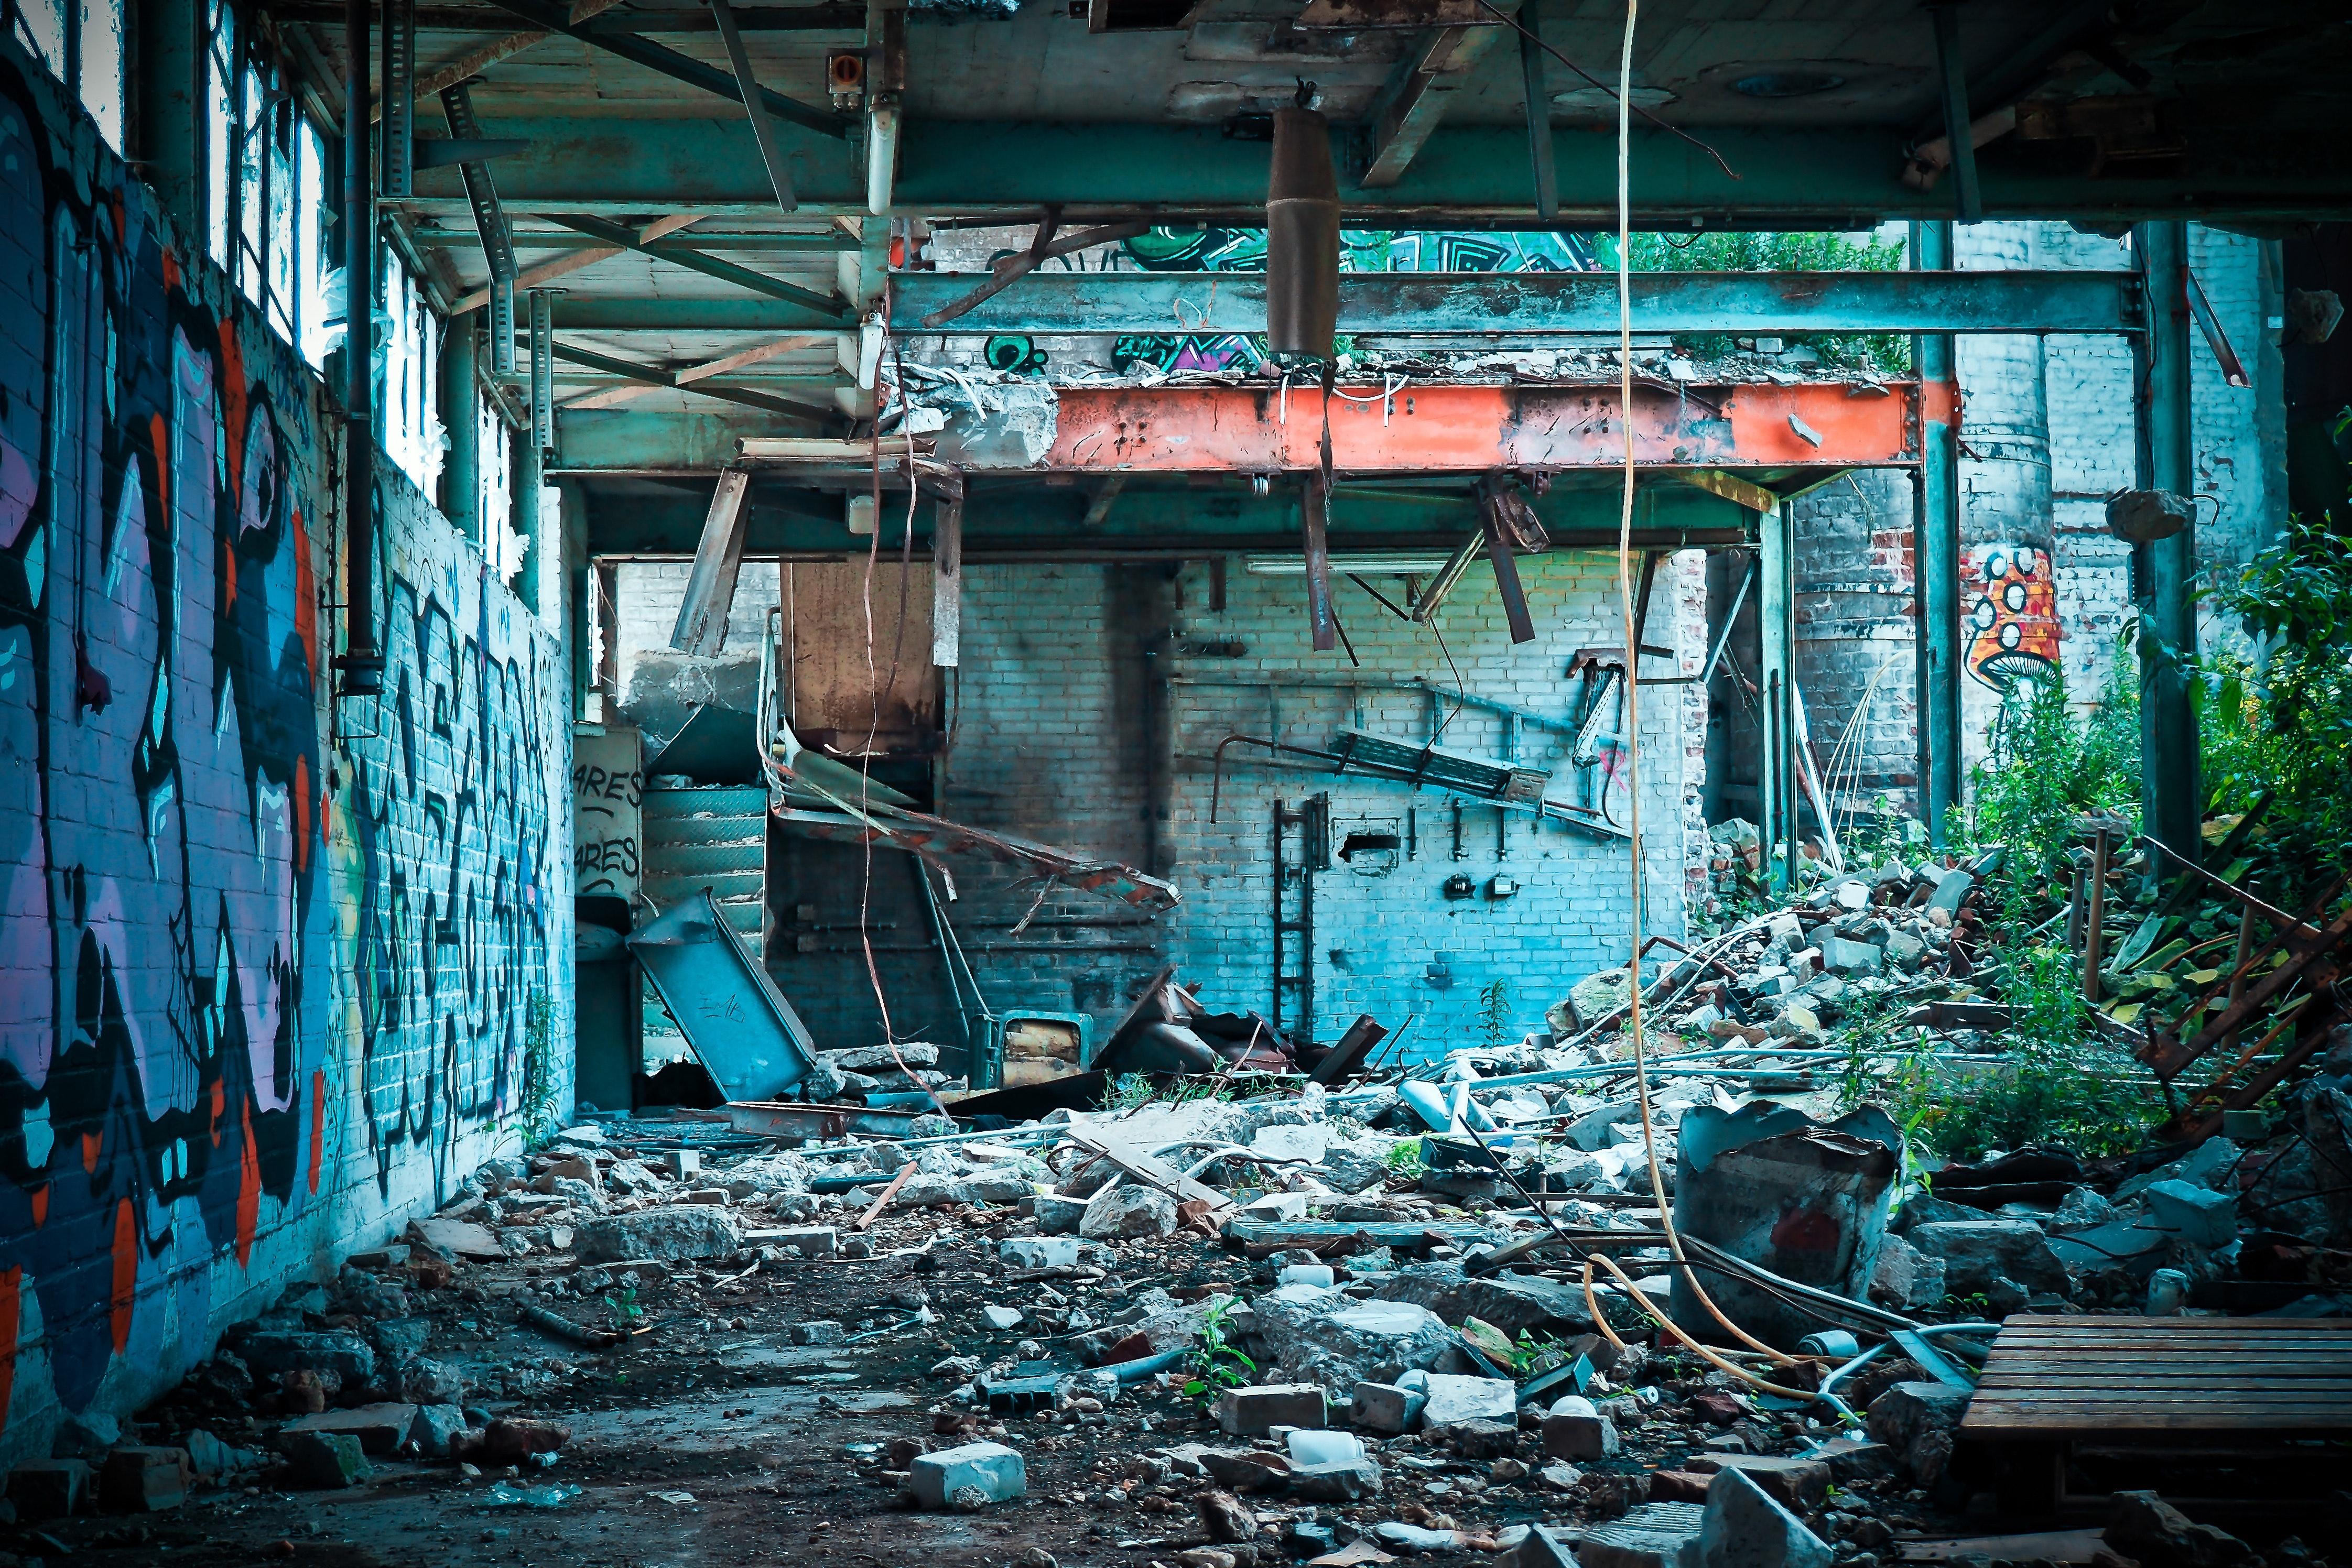 Abandon concrete building during daytime photo